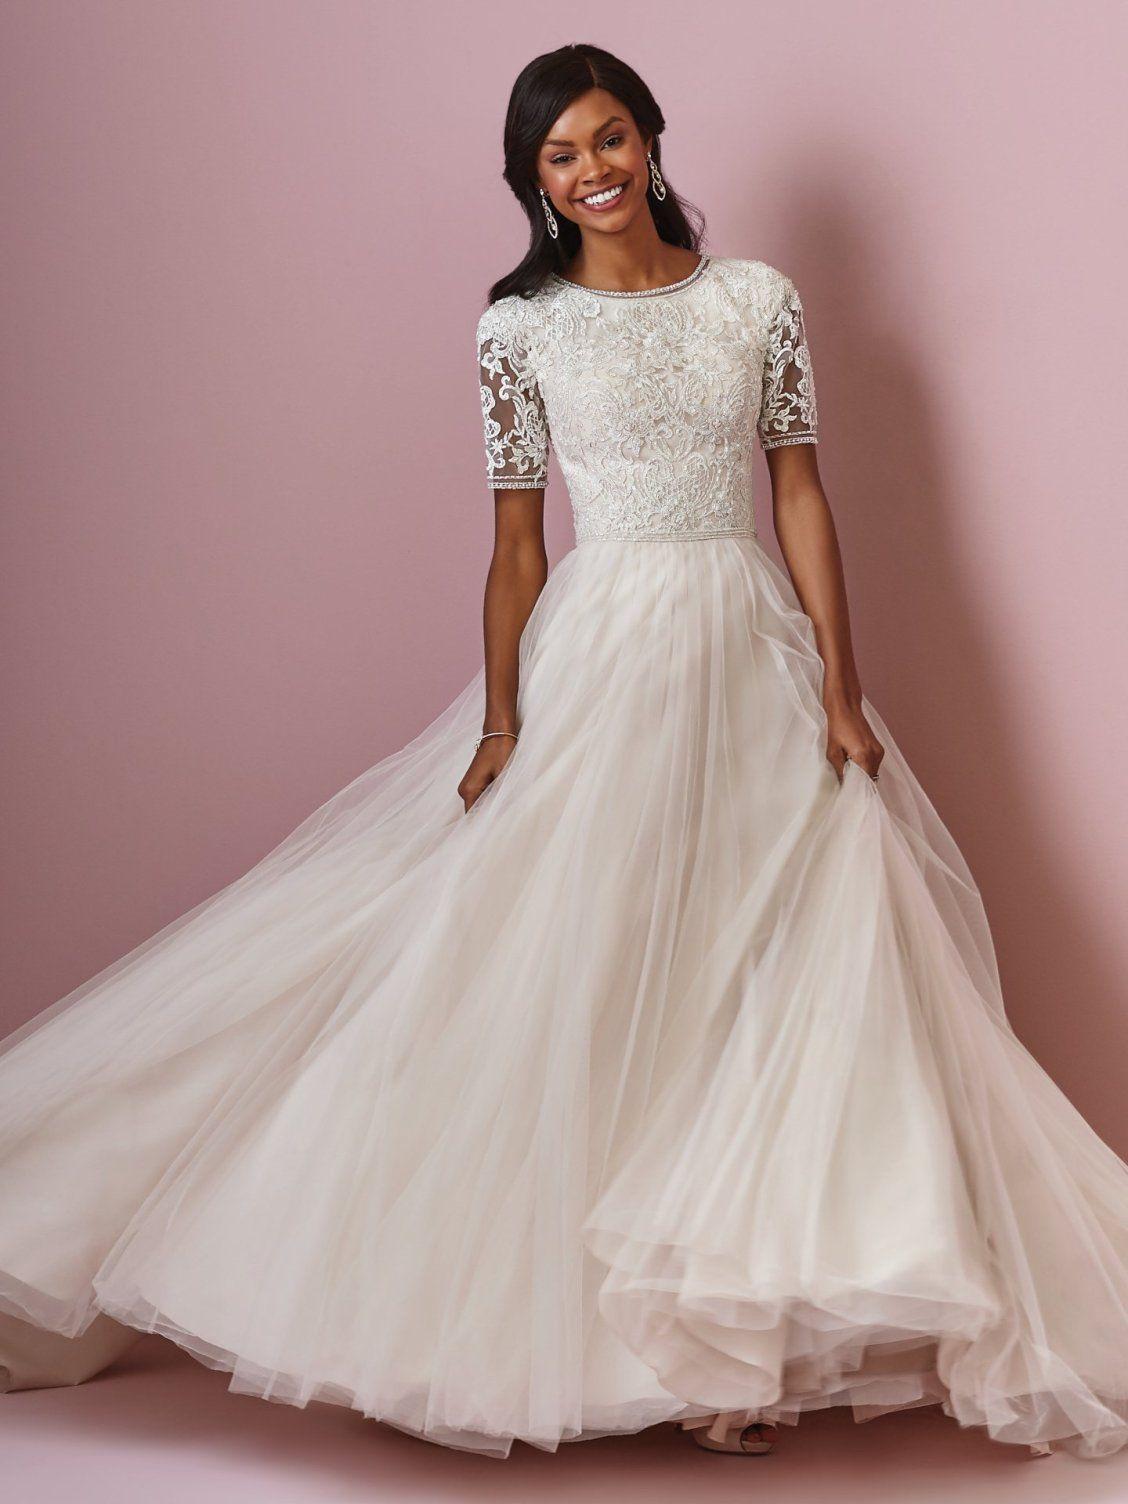 Eliza Anne By Rebecca Ingram Wedding Dresses Wedding Dresses Modest Bridal Gowns Perfect Wedding Dress